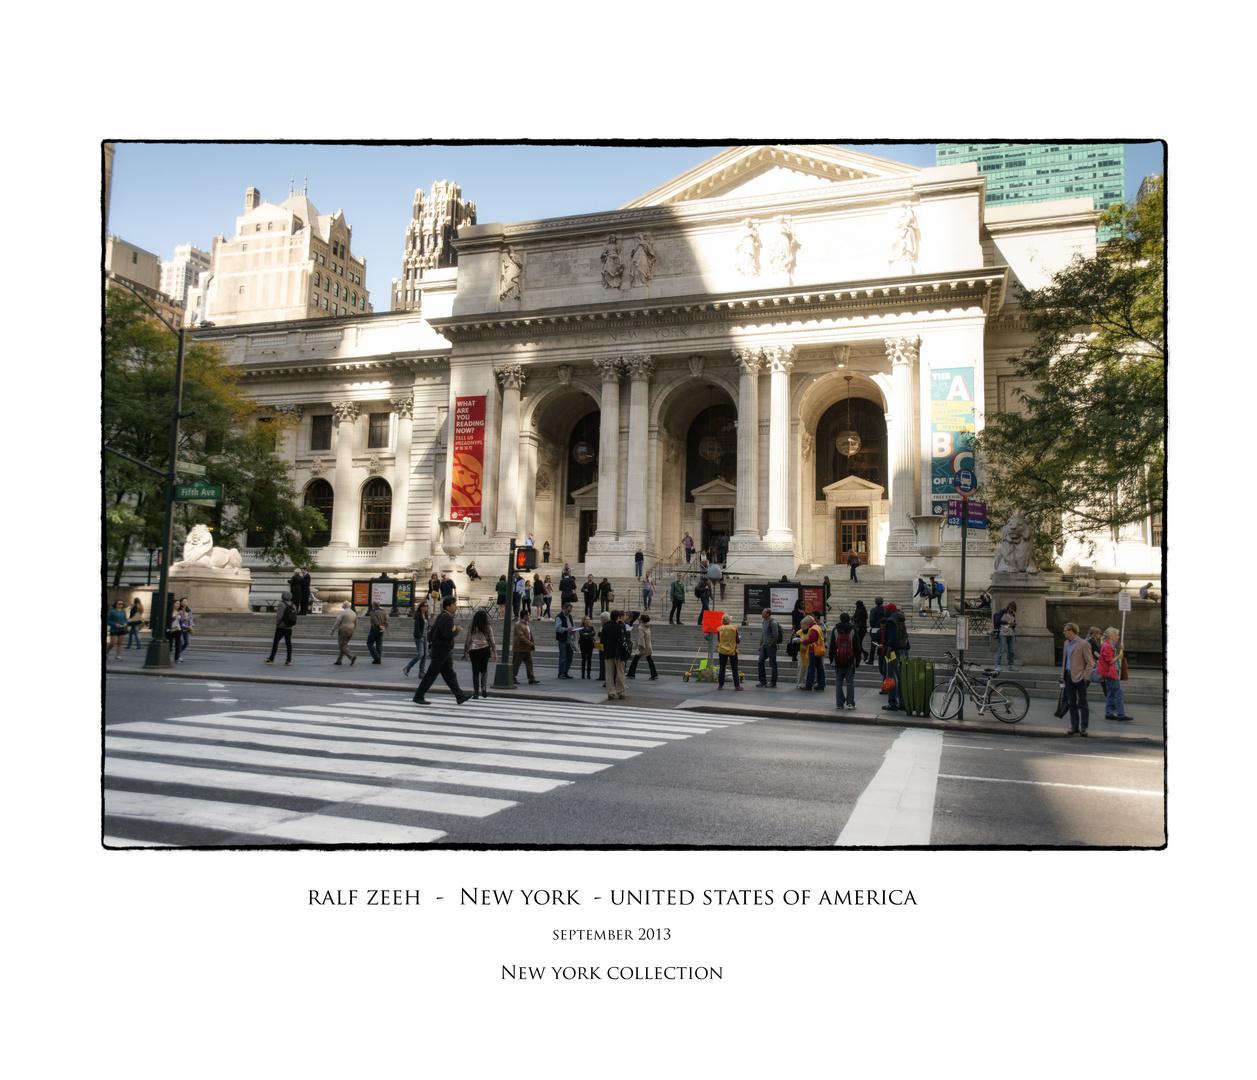 New York Public Library no.1